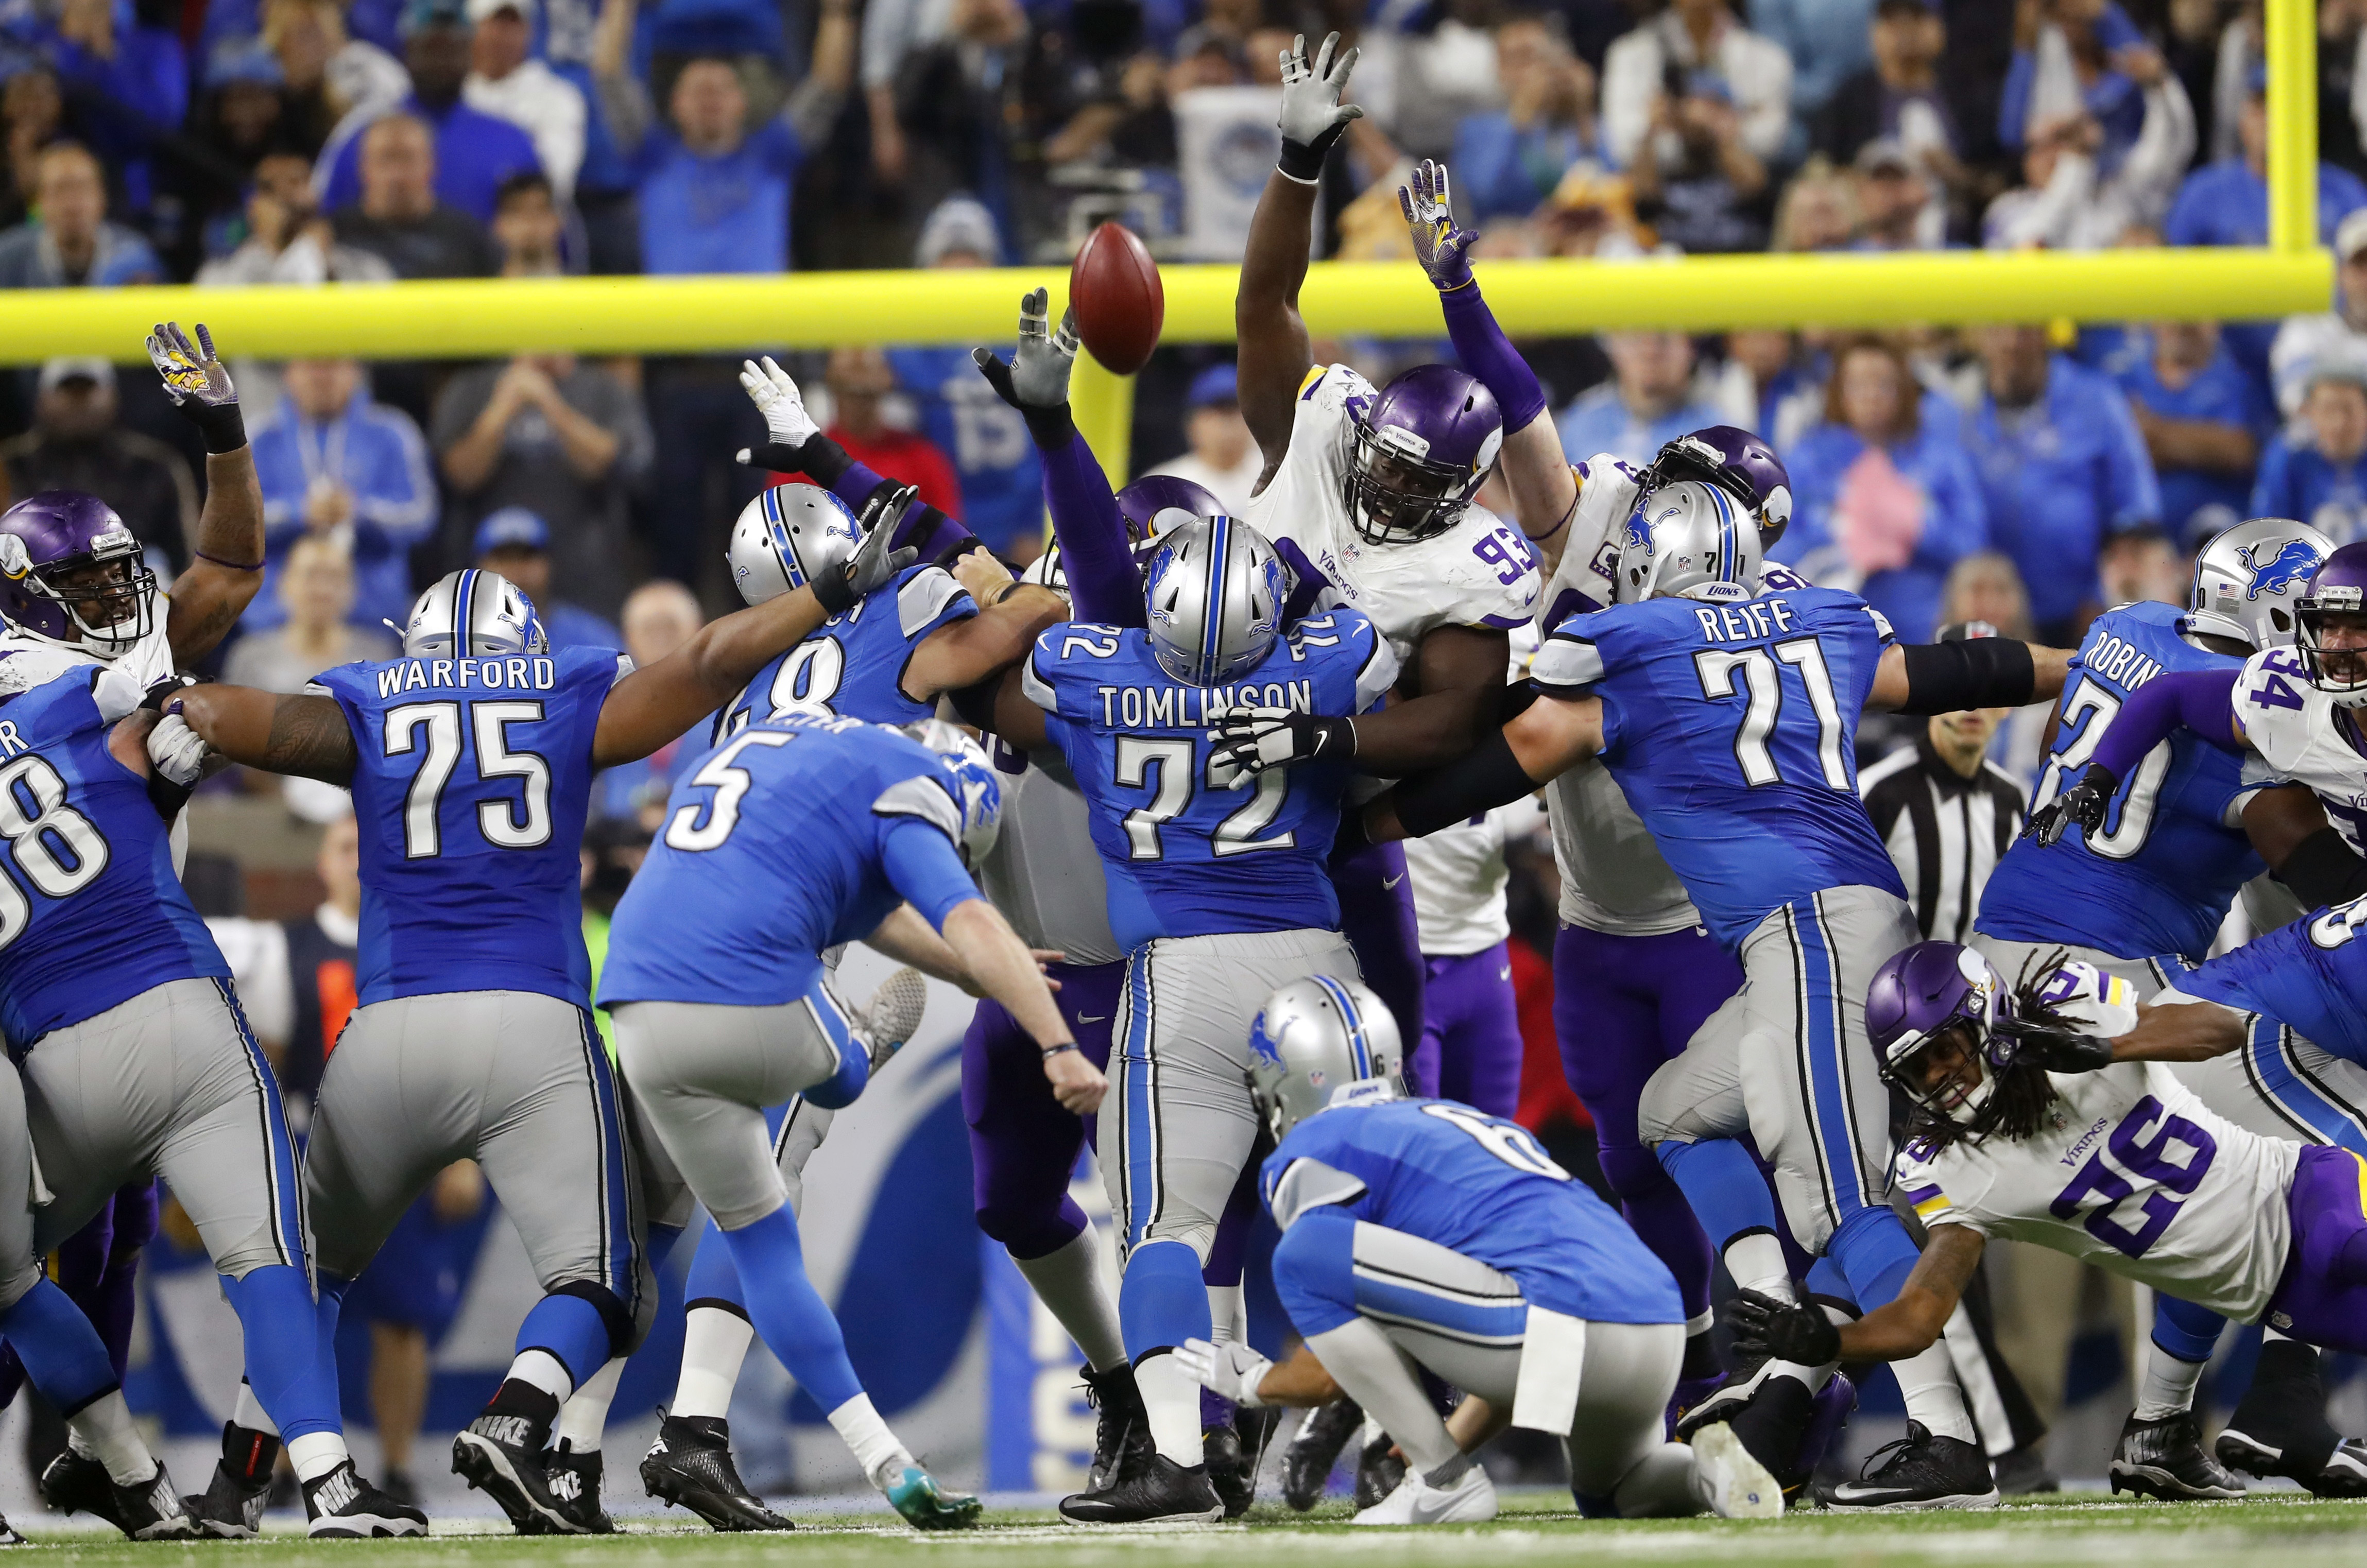 Detroit Lions kicker Matt Prater (5) makes a 40-yard winning field goal during the second half of an NFL football game against the Minnesota Vikings, Thursday, Nov. 24, 2016, in Detroit. (AP Photo/Paul Sancya)